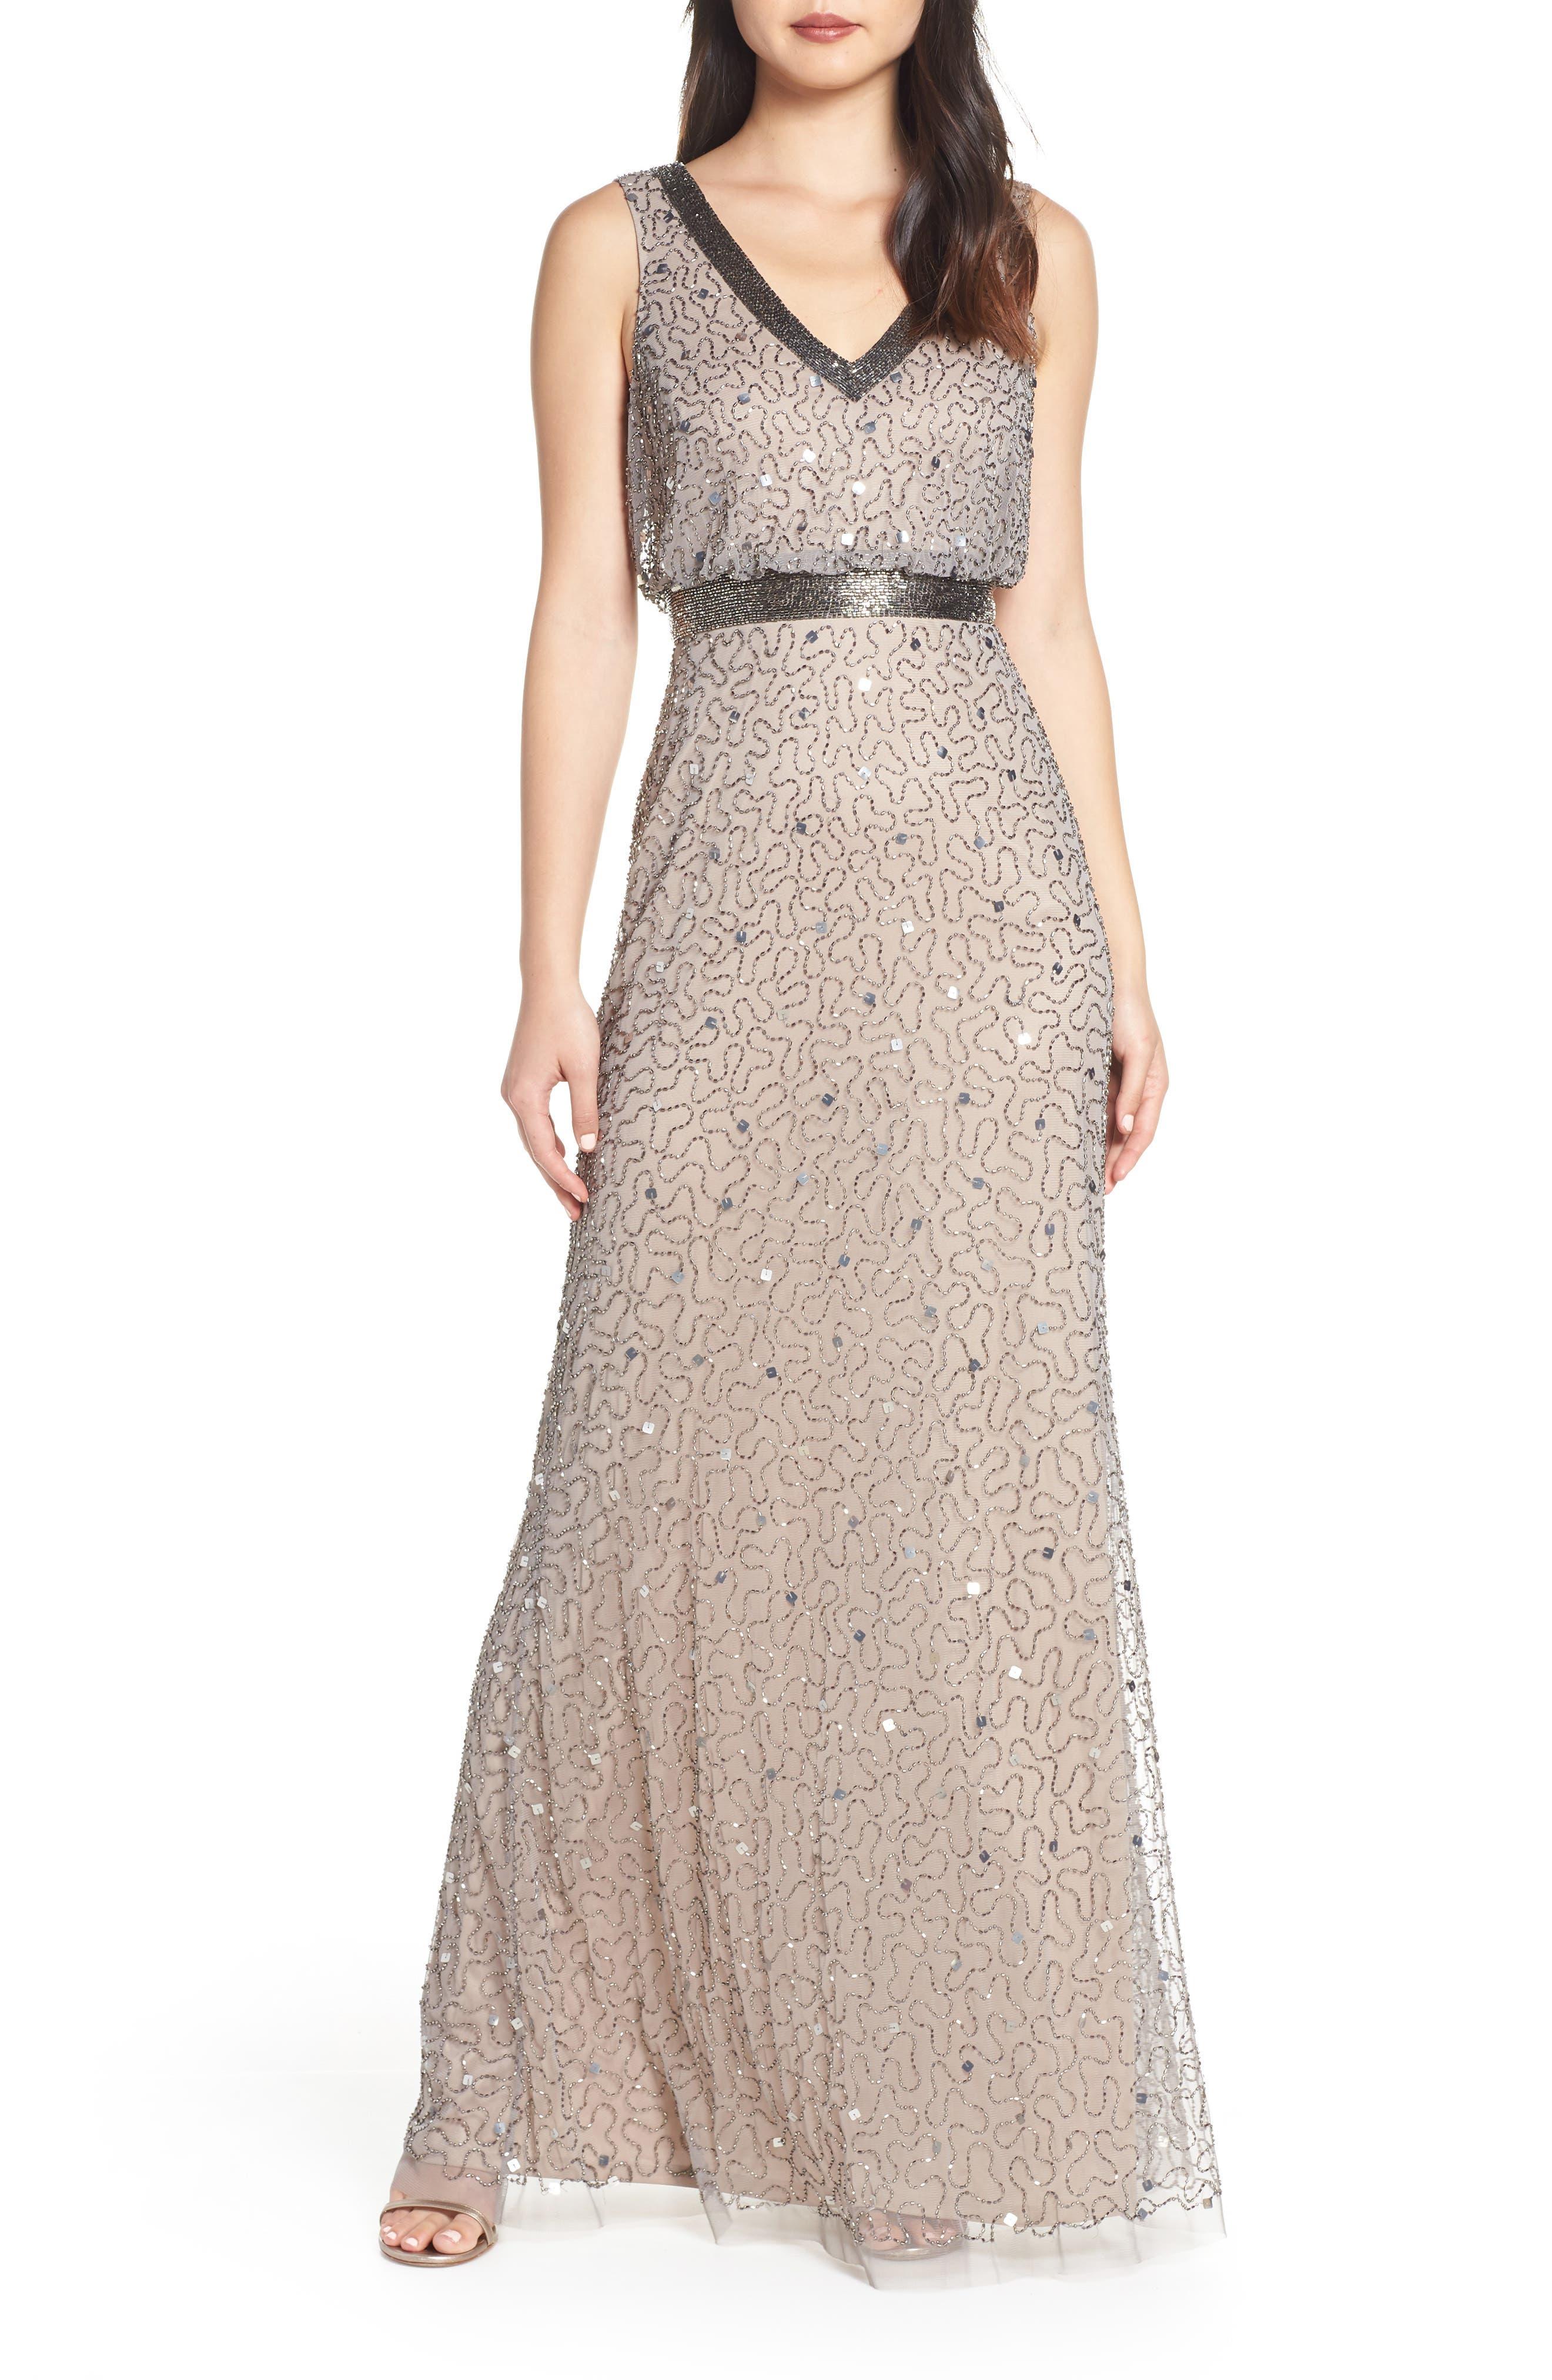 Adrianna Papell Beaded Mesh Evening Dress, Beige